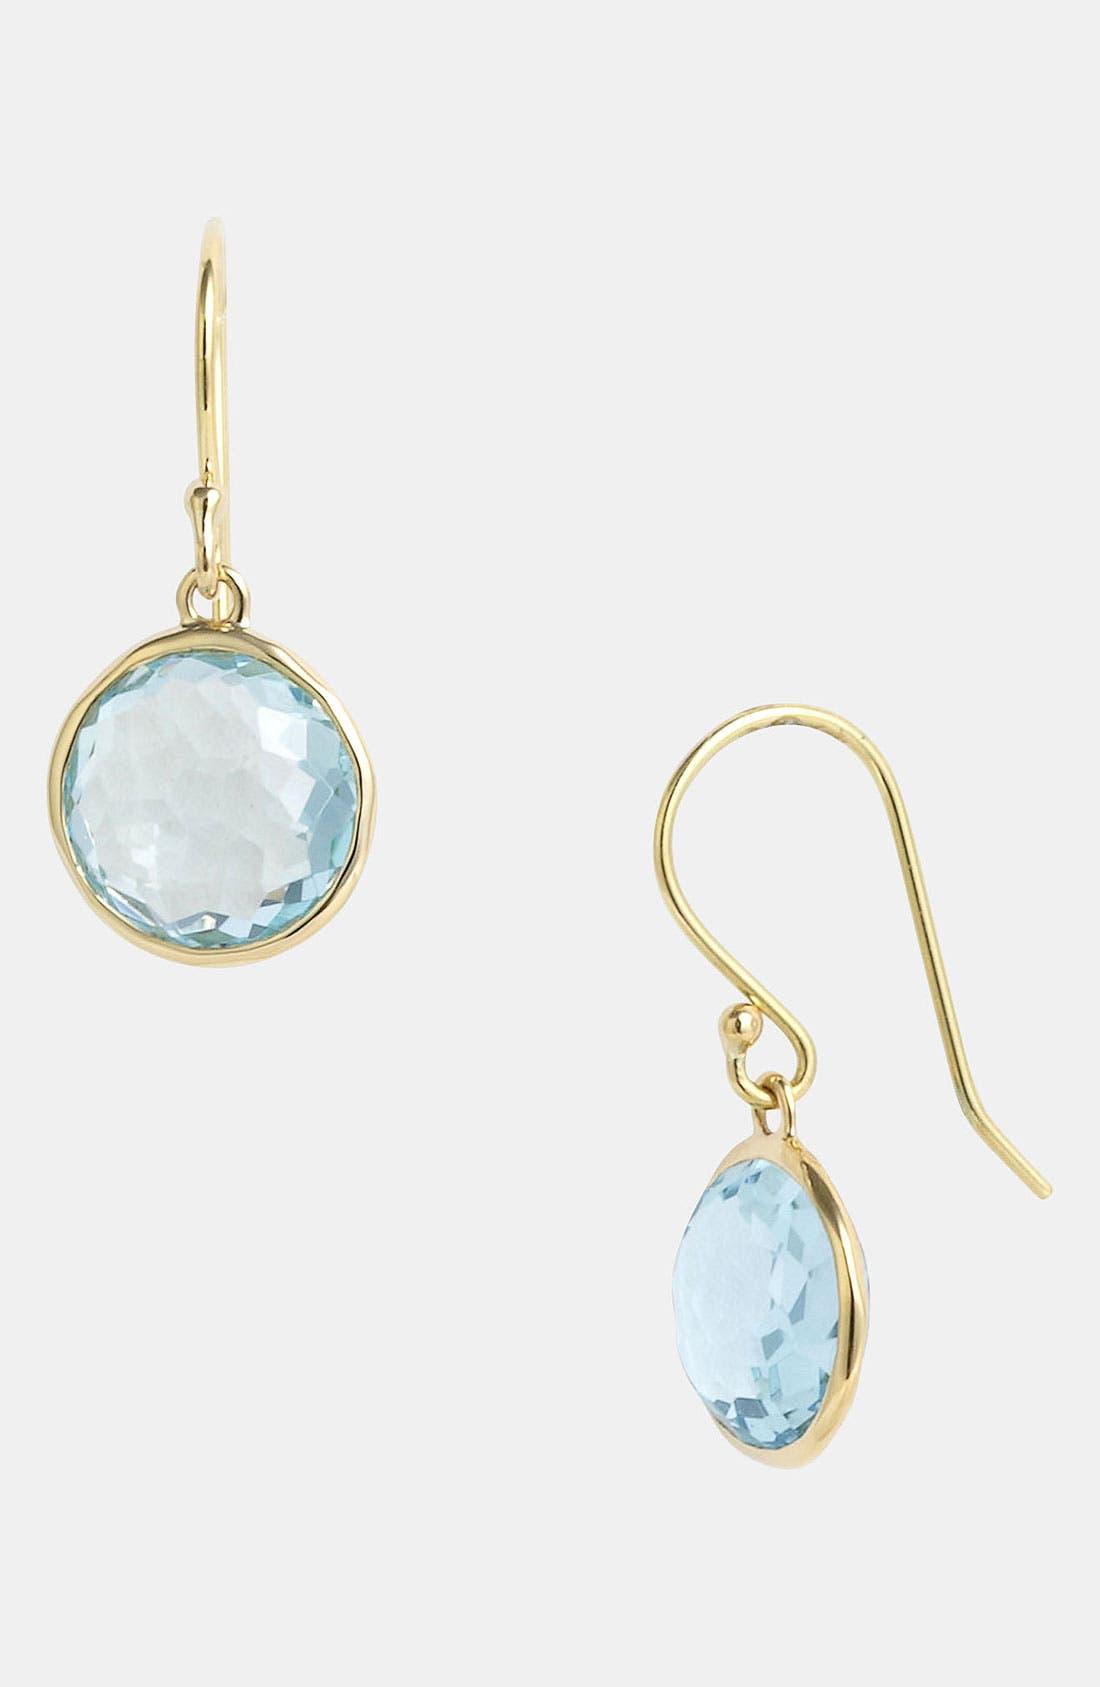 'Rock Candy - Mini Lollipop' 18k Gold Drop Earrings,                             Main thumbnail 1, color,                             710